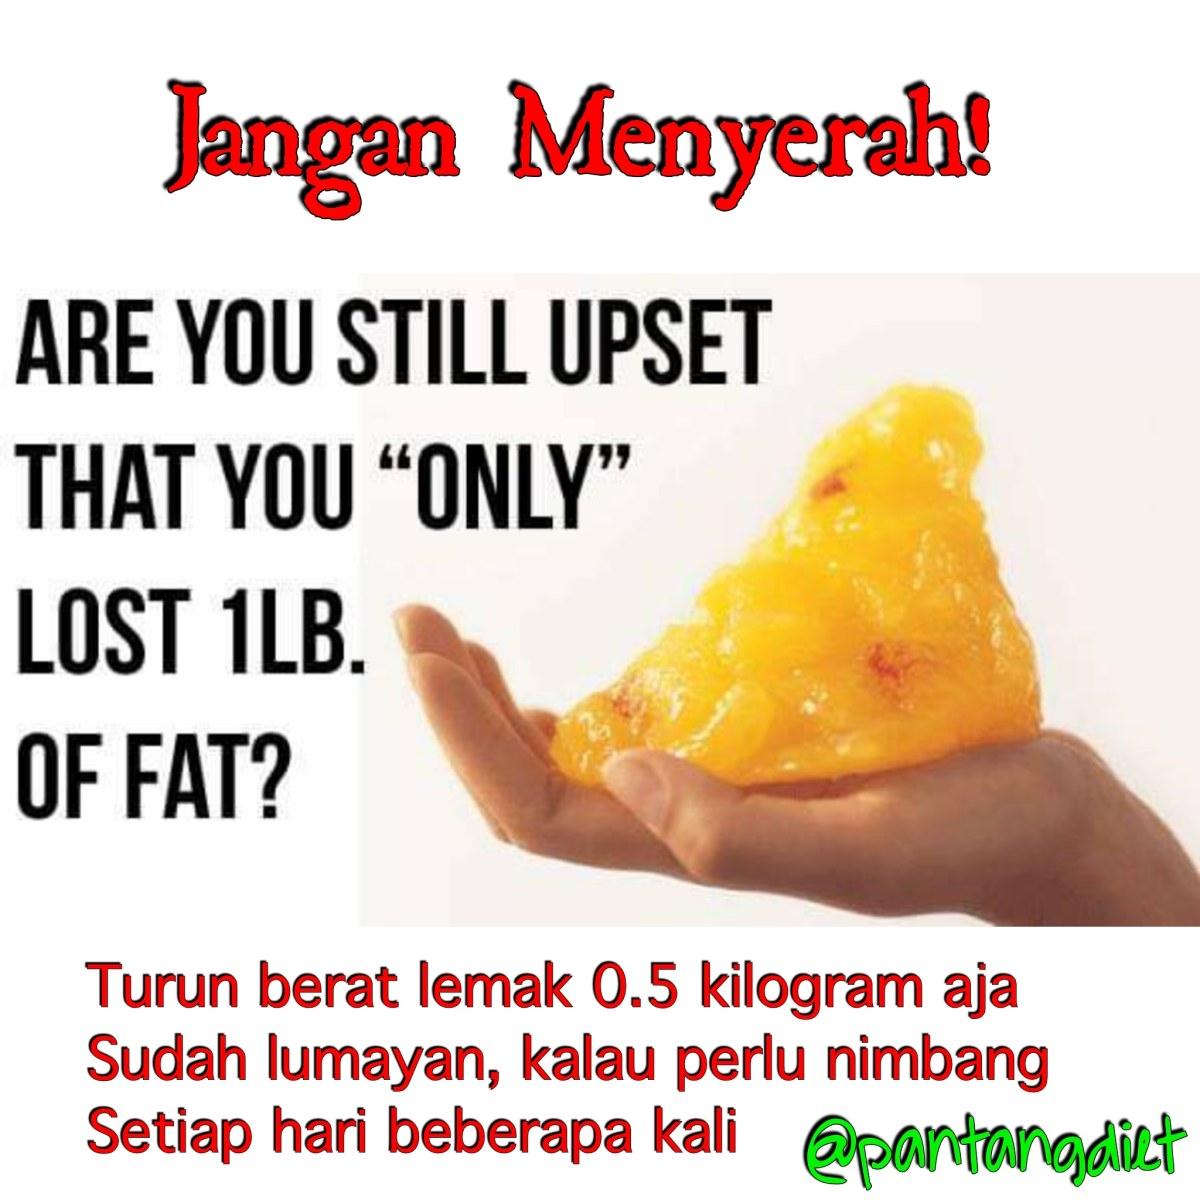 Makanan Penambah Berat Badan yang Sehat